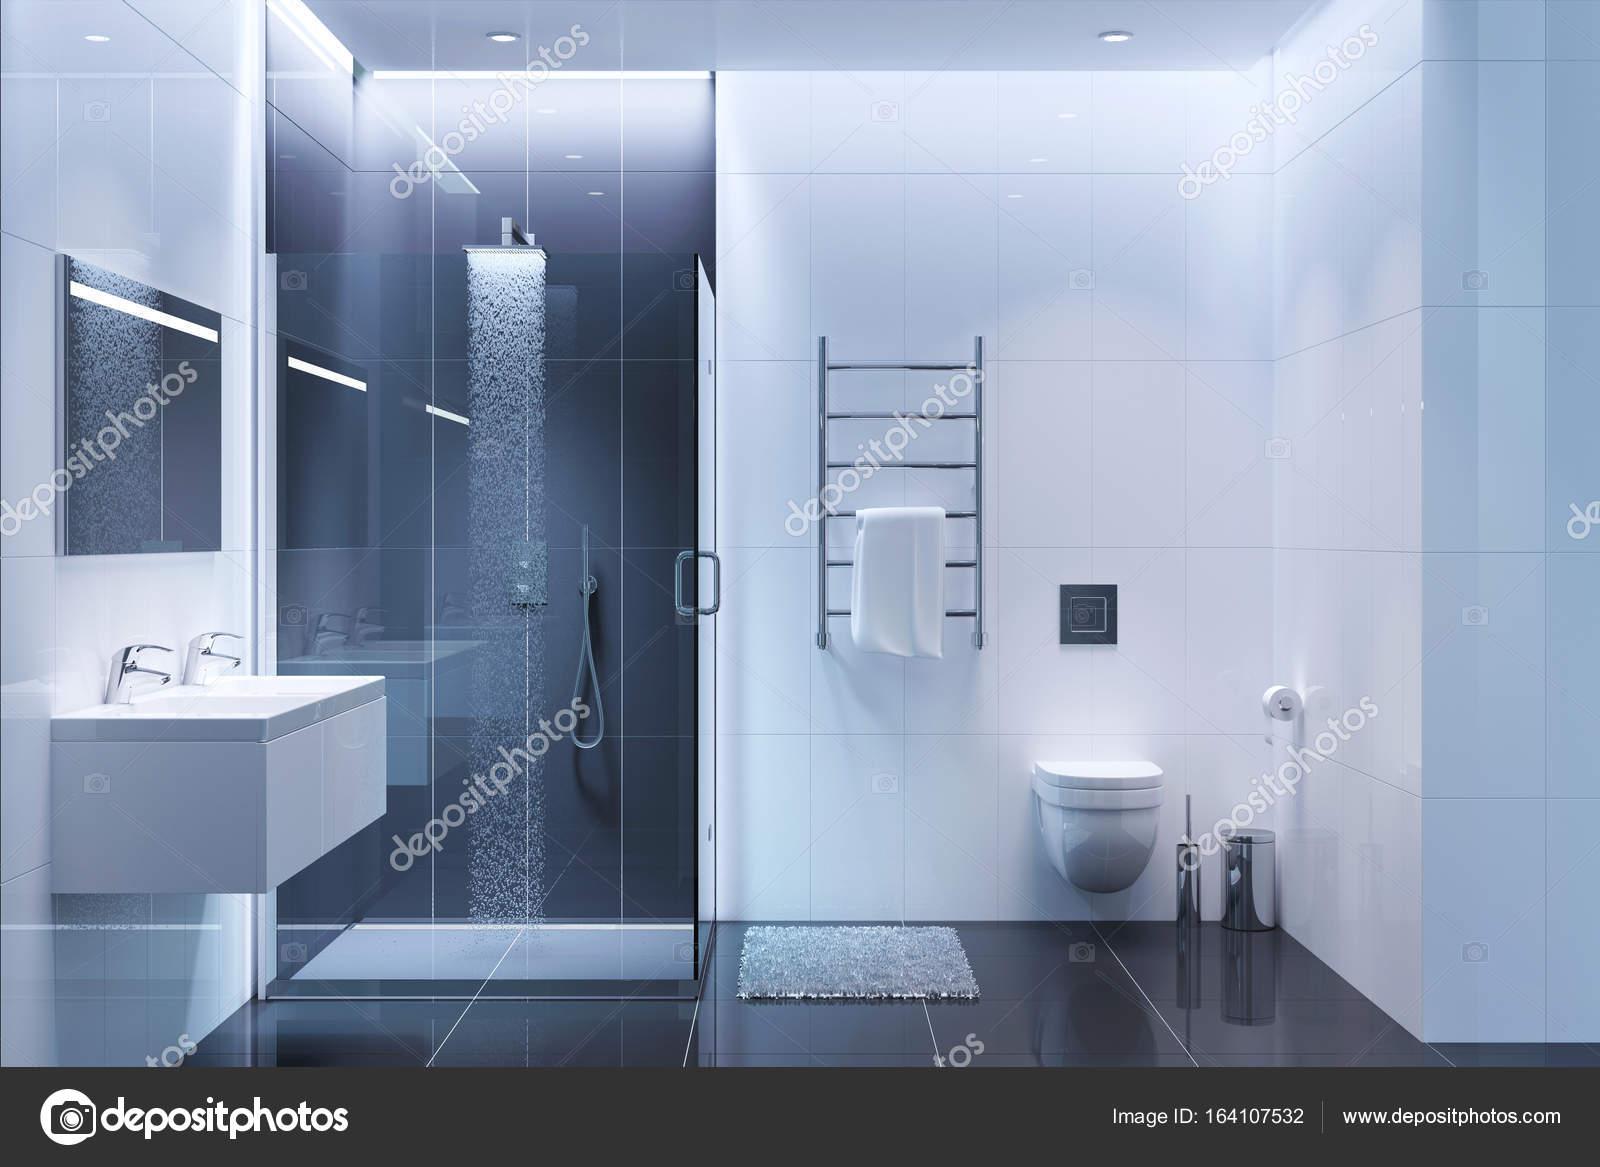 Bagno Moderno Bianco E Nero.Bagno Moderno Bianco E Nero Di Sera Foto Stock C Gamespiritlife